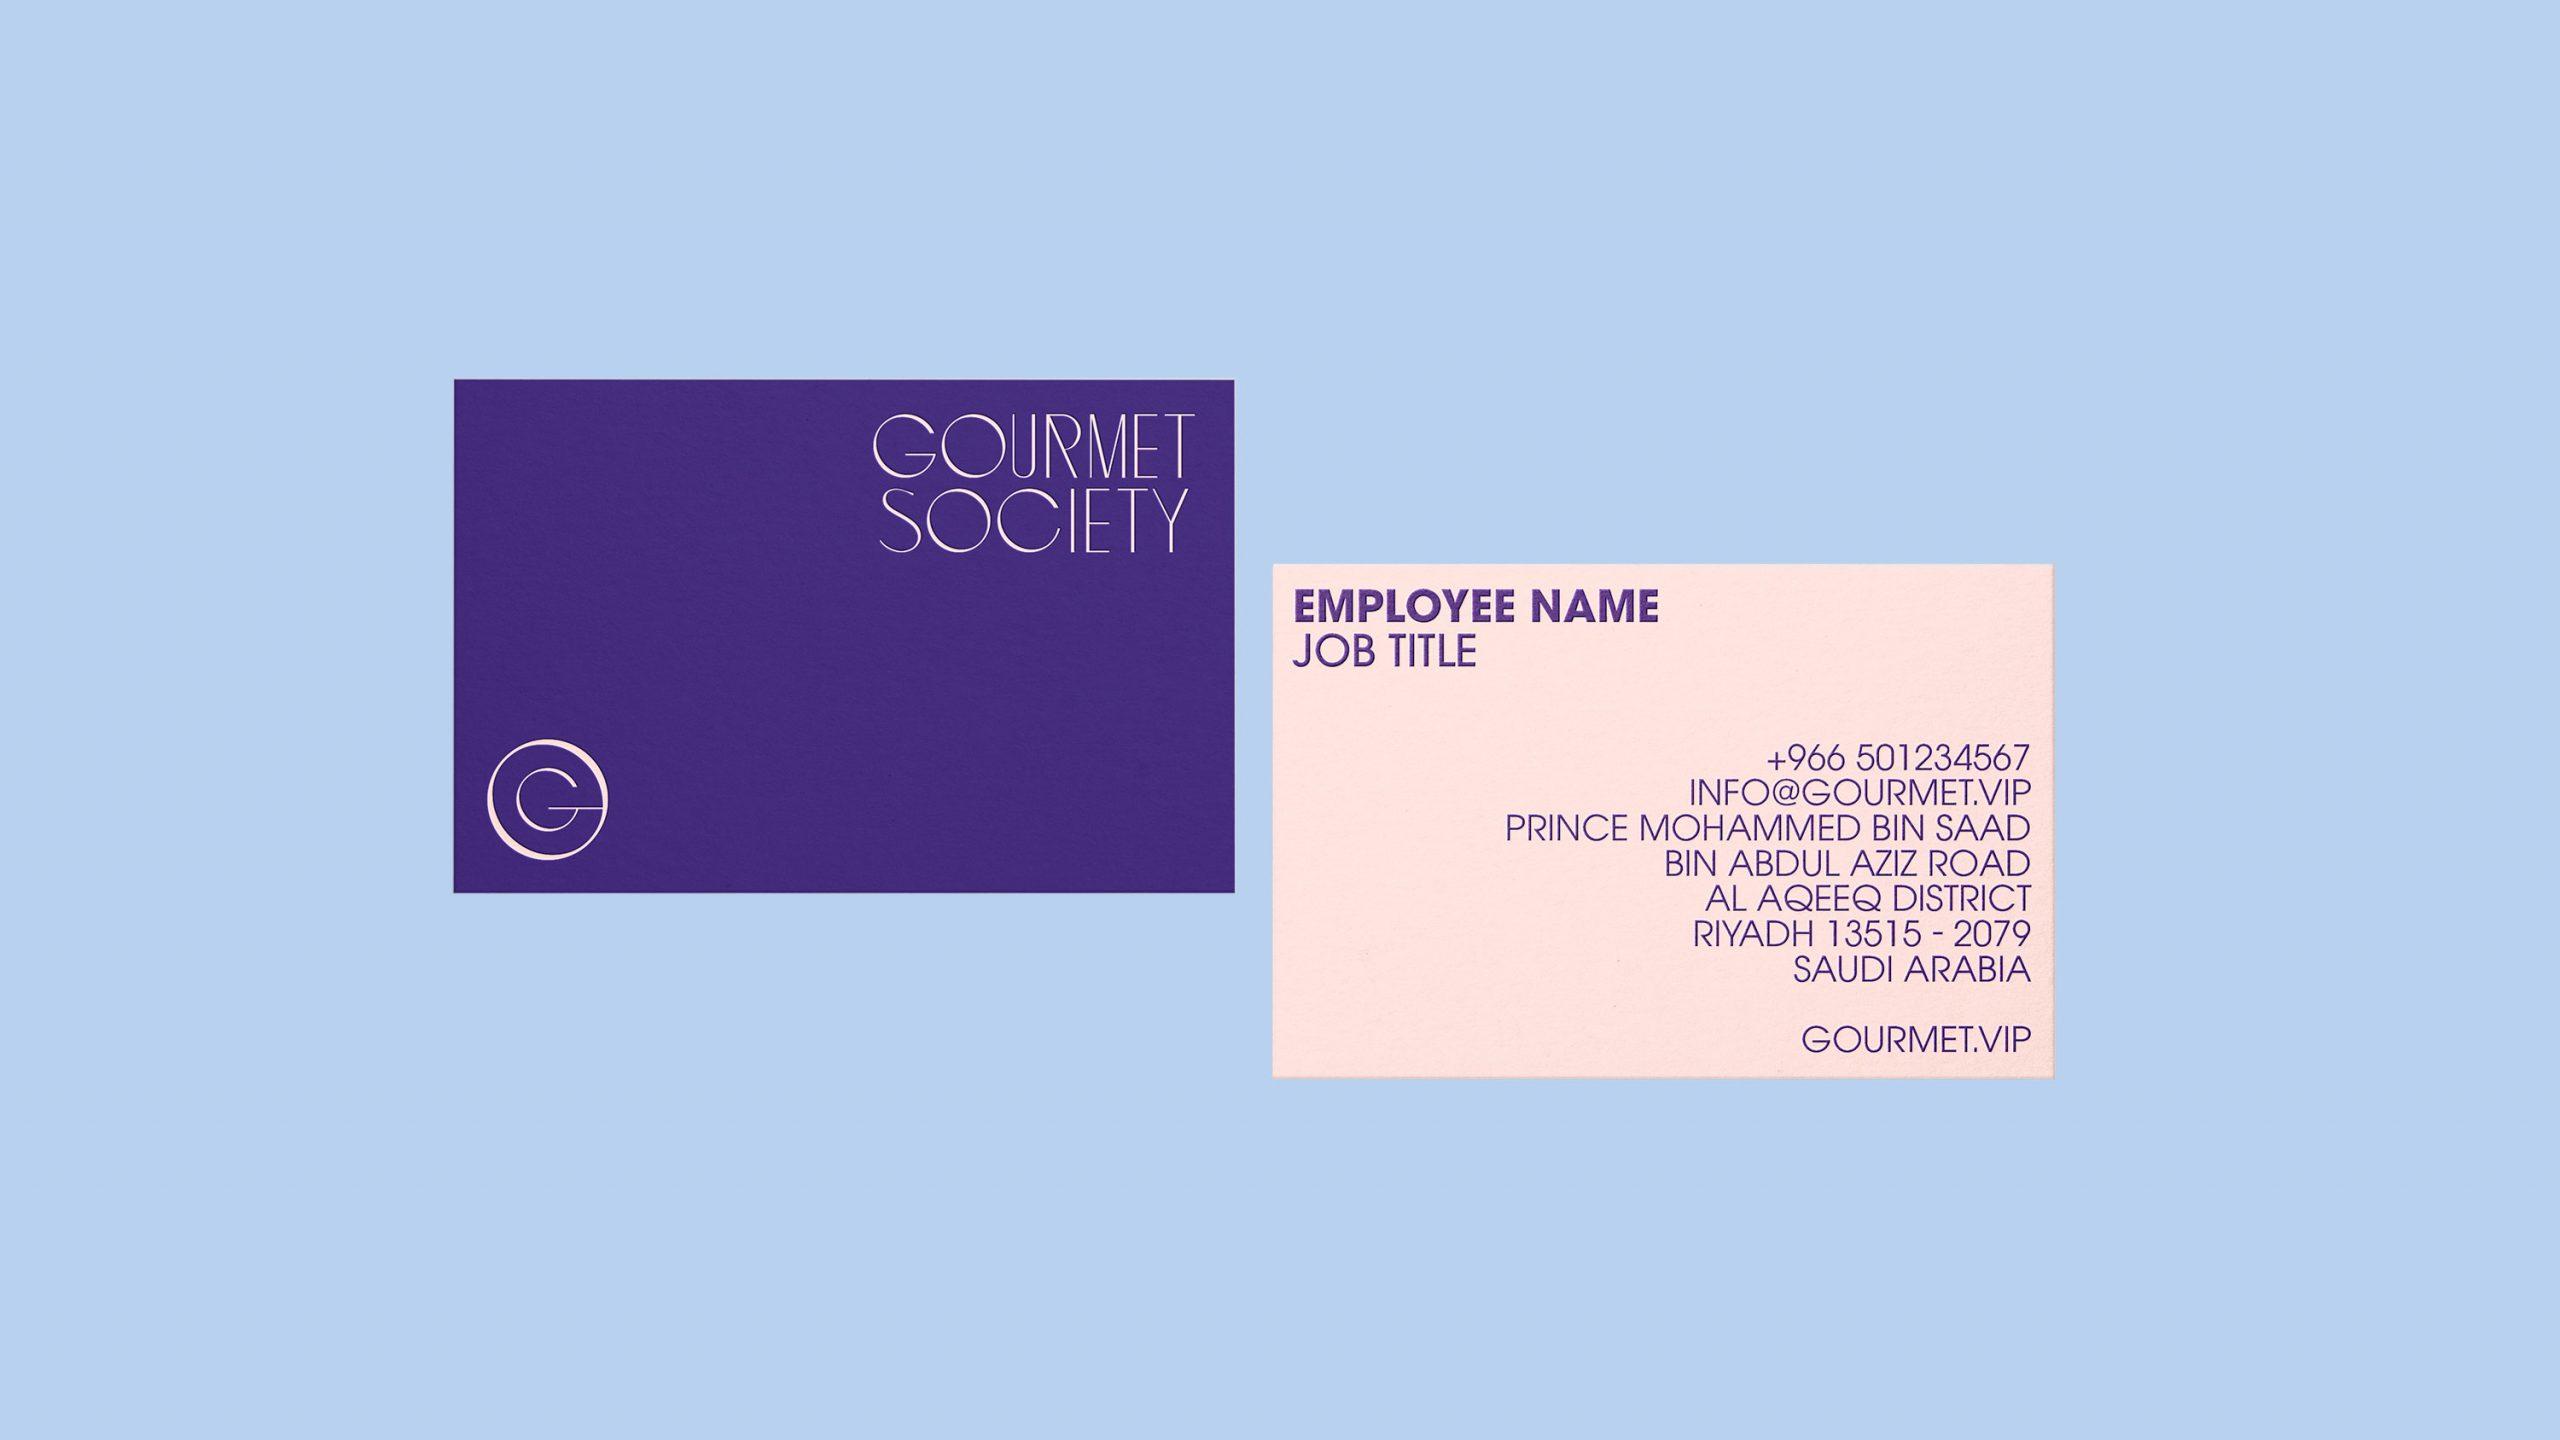 GourmetSociety-Work-By-YaStudio-01